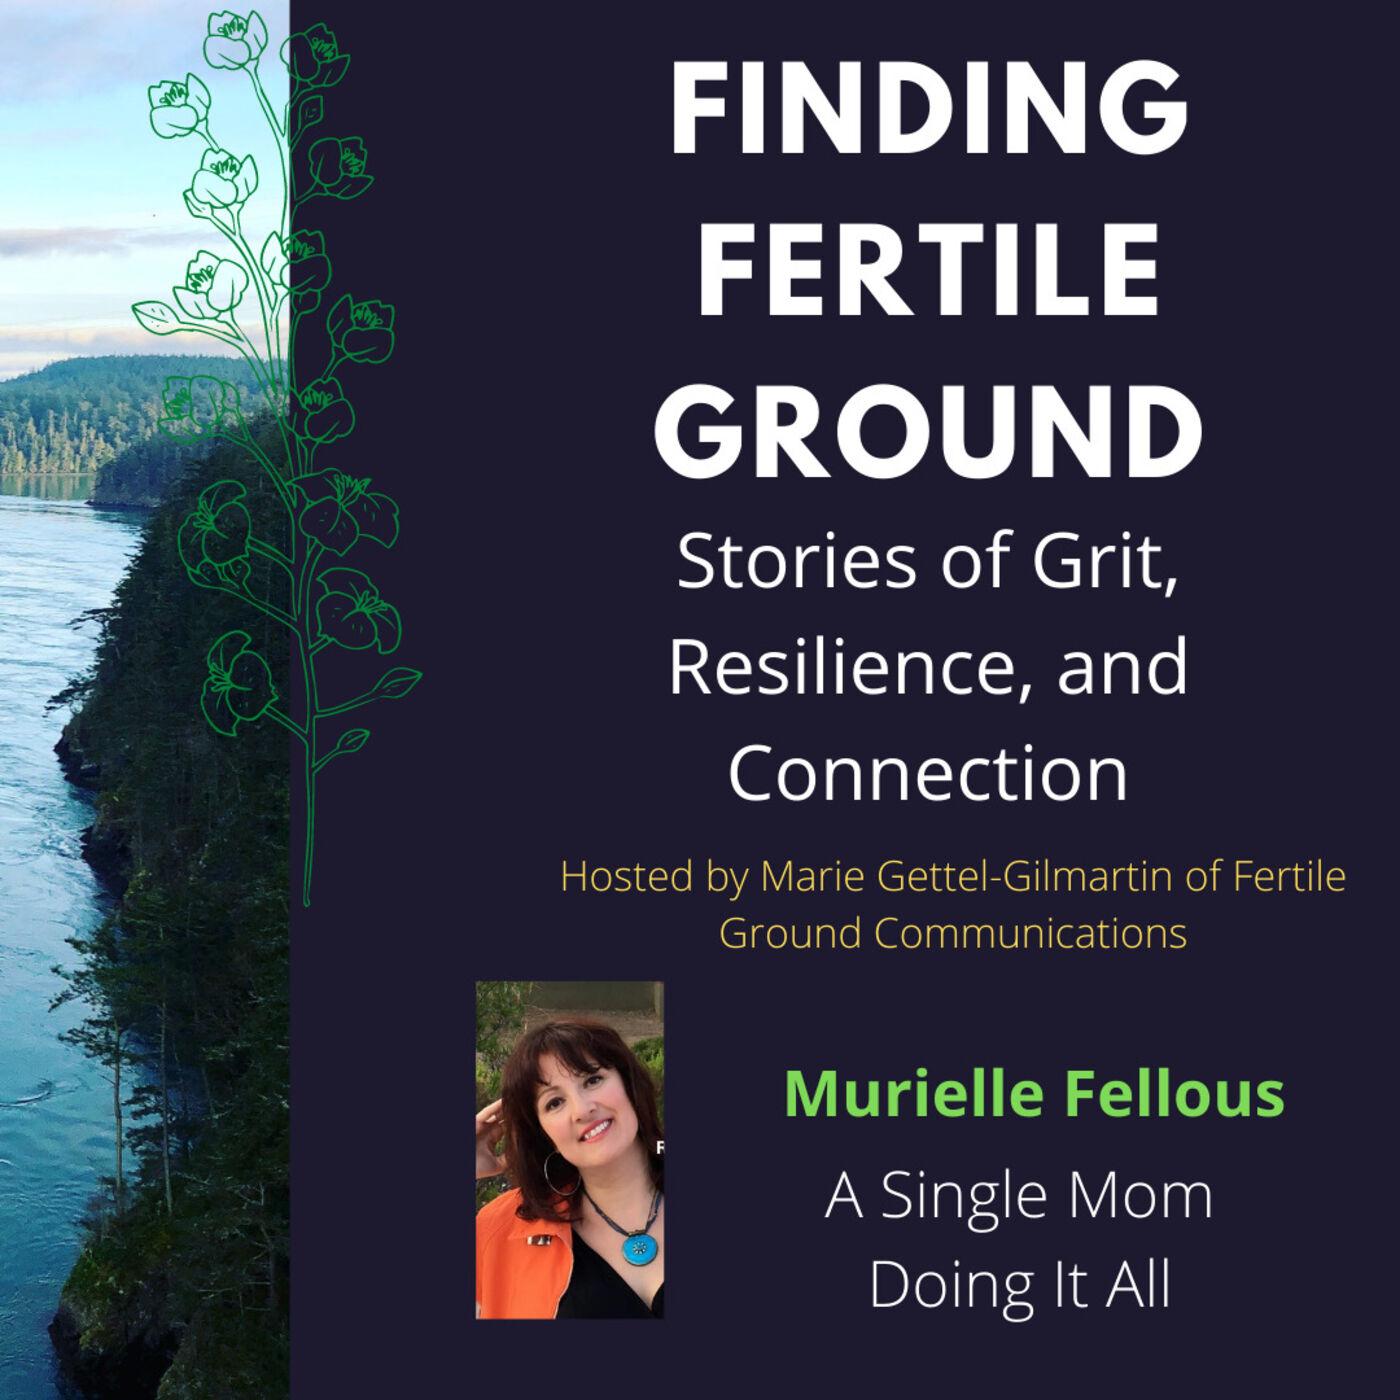 Murielle Fellous: Single Mom Doing It All